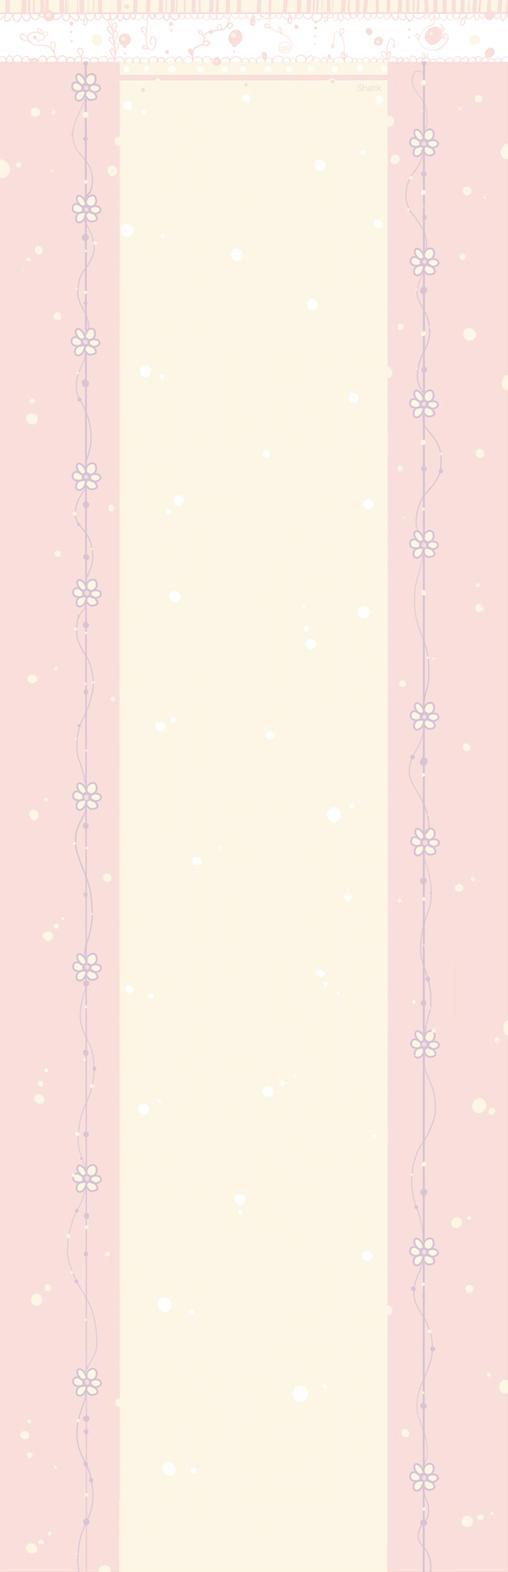 FREE Custombox Background - Pink Balloon by Shatik